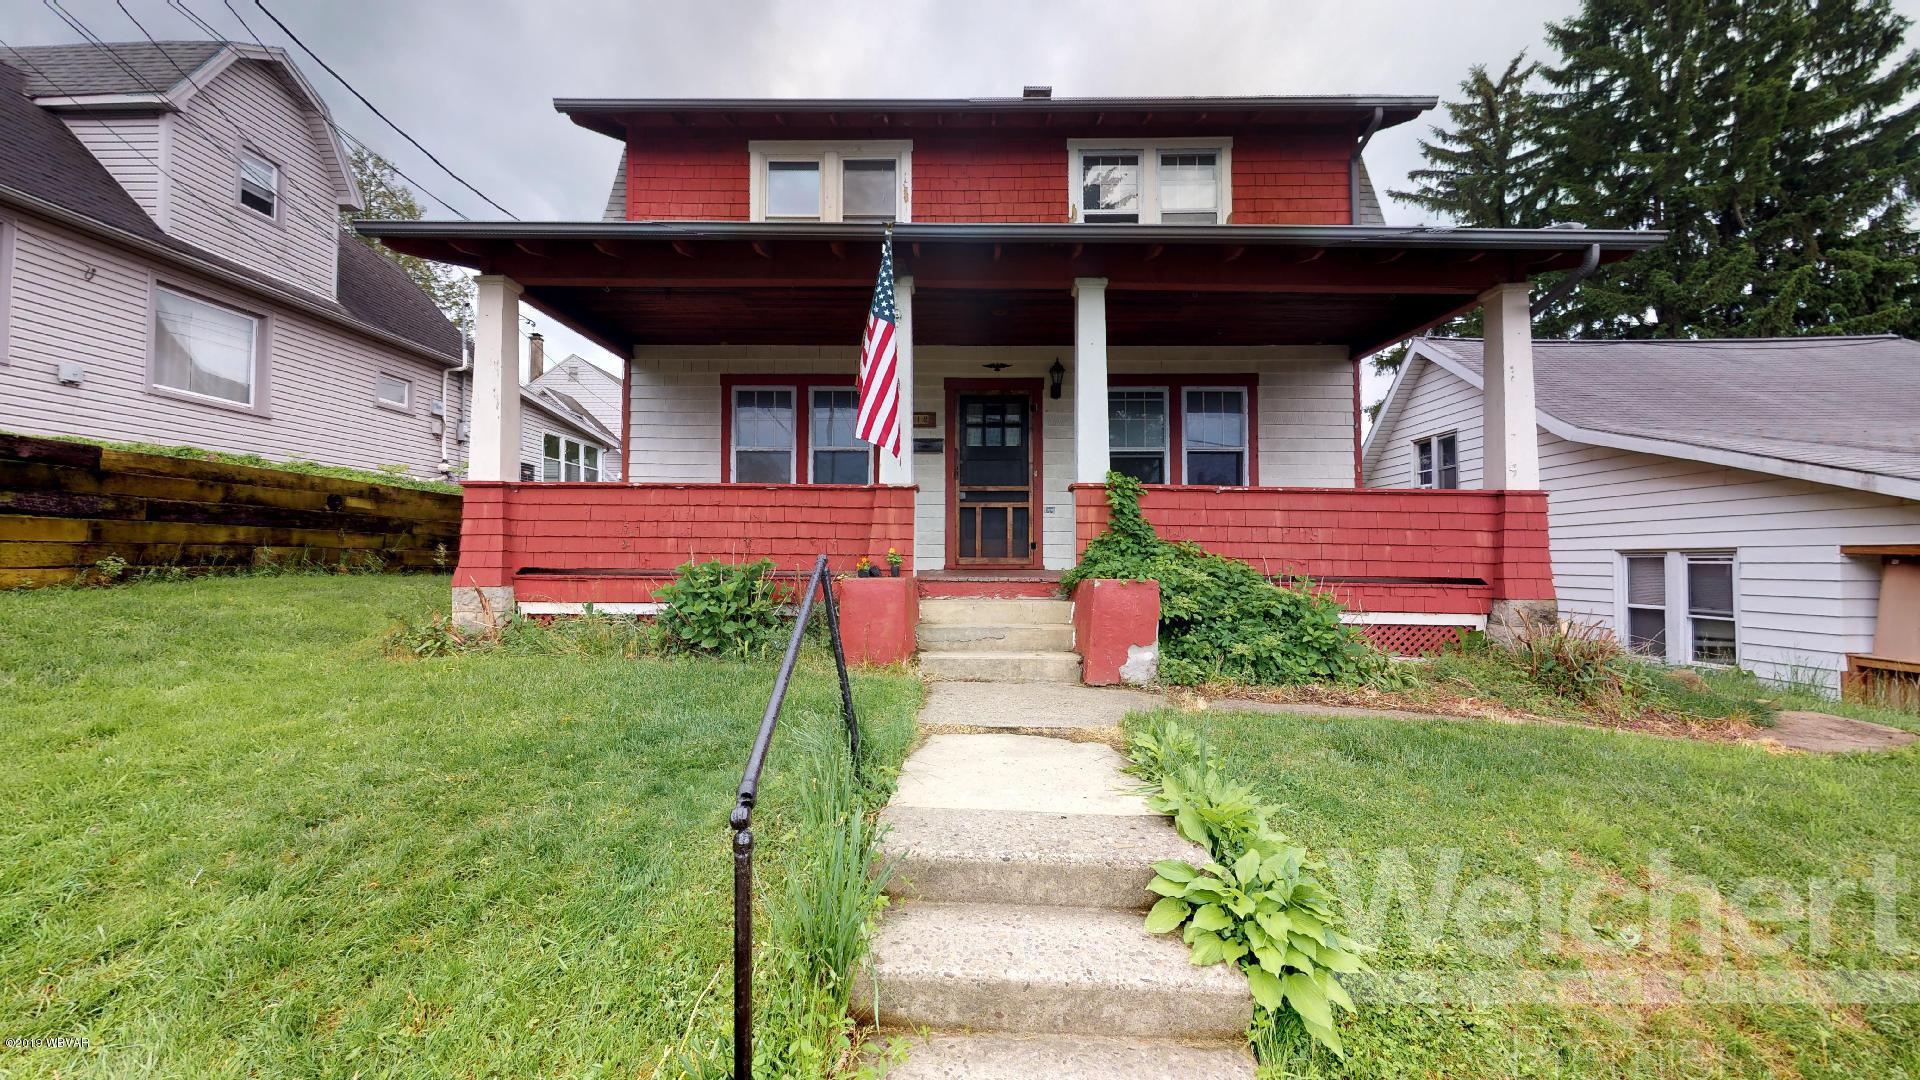 212 ELM STREET,S. Williamsport,PA 17702,3 Bedrooms Bedrooms,1 BathroomBathrooms,Residential,ELM,WB-87402